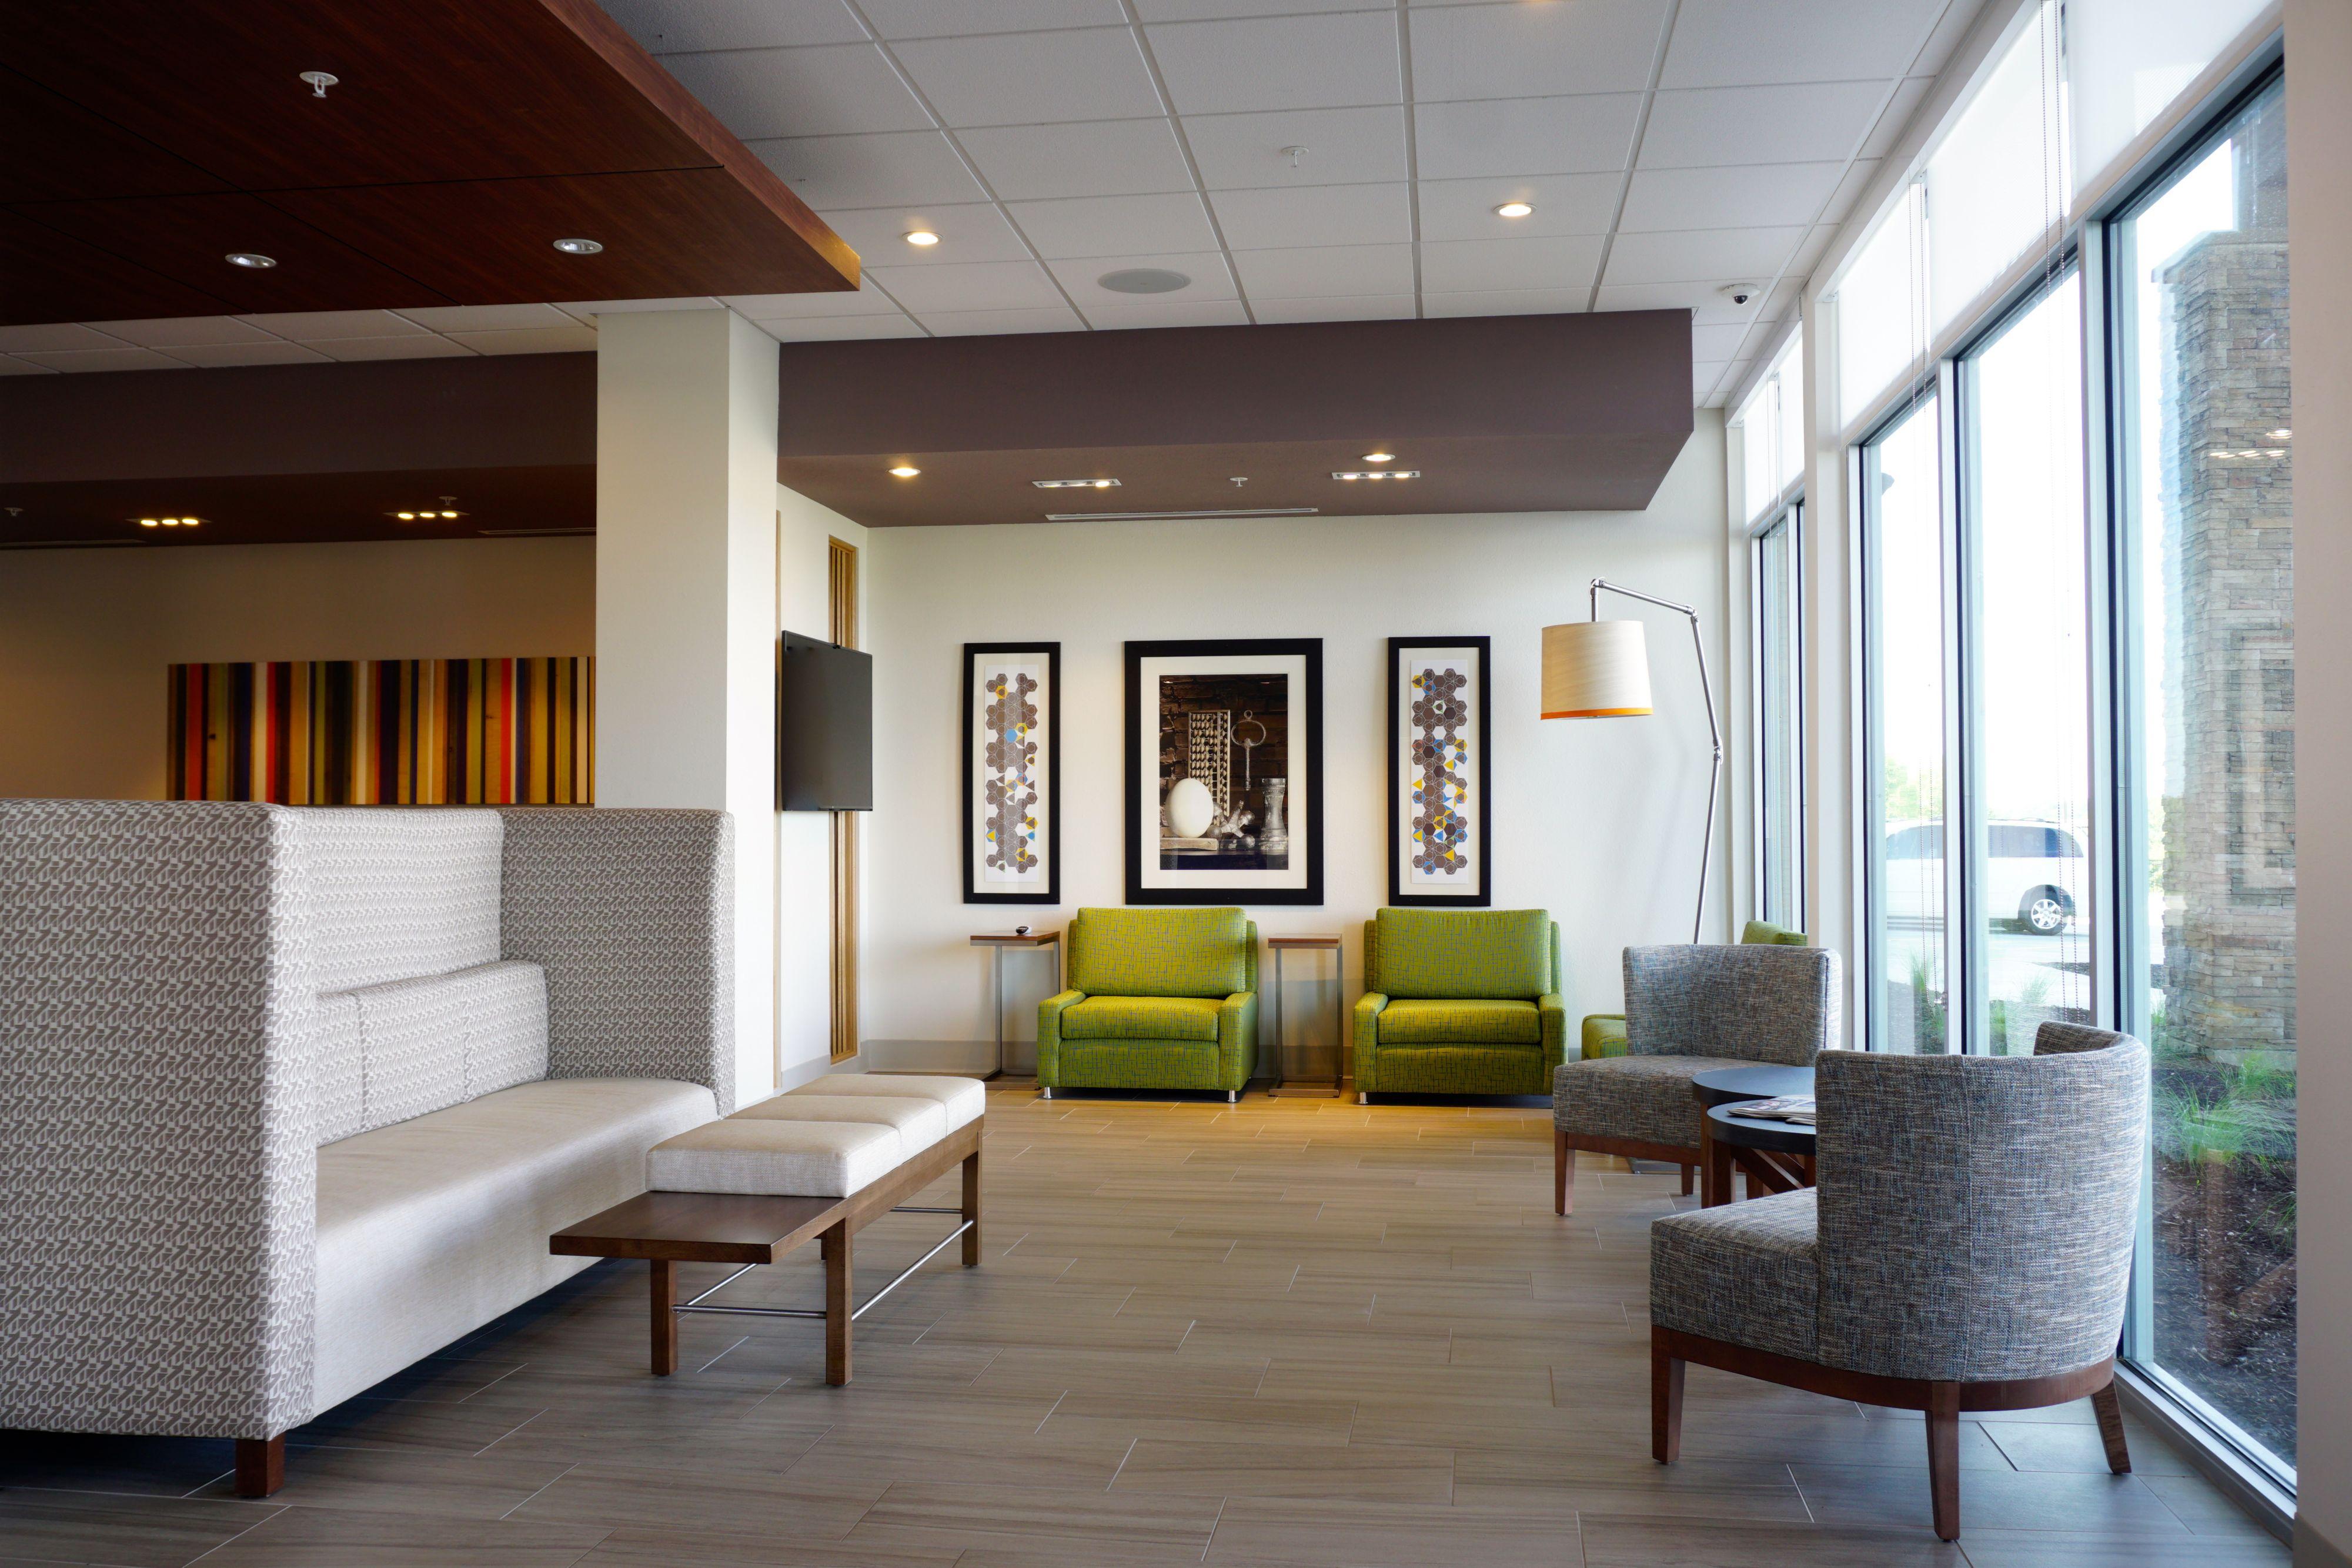 Holiday Inn Express & Suites Omaha - Millard Area image 4